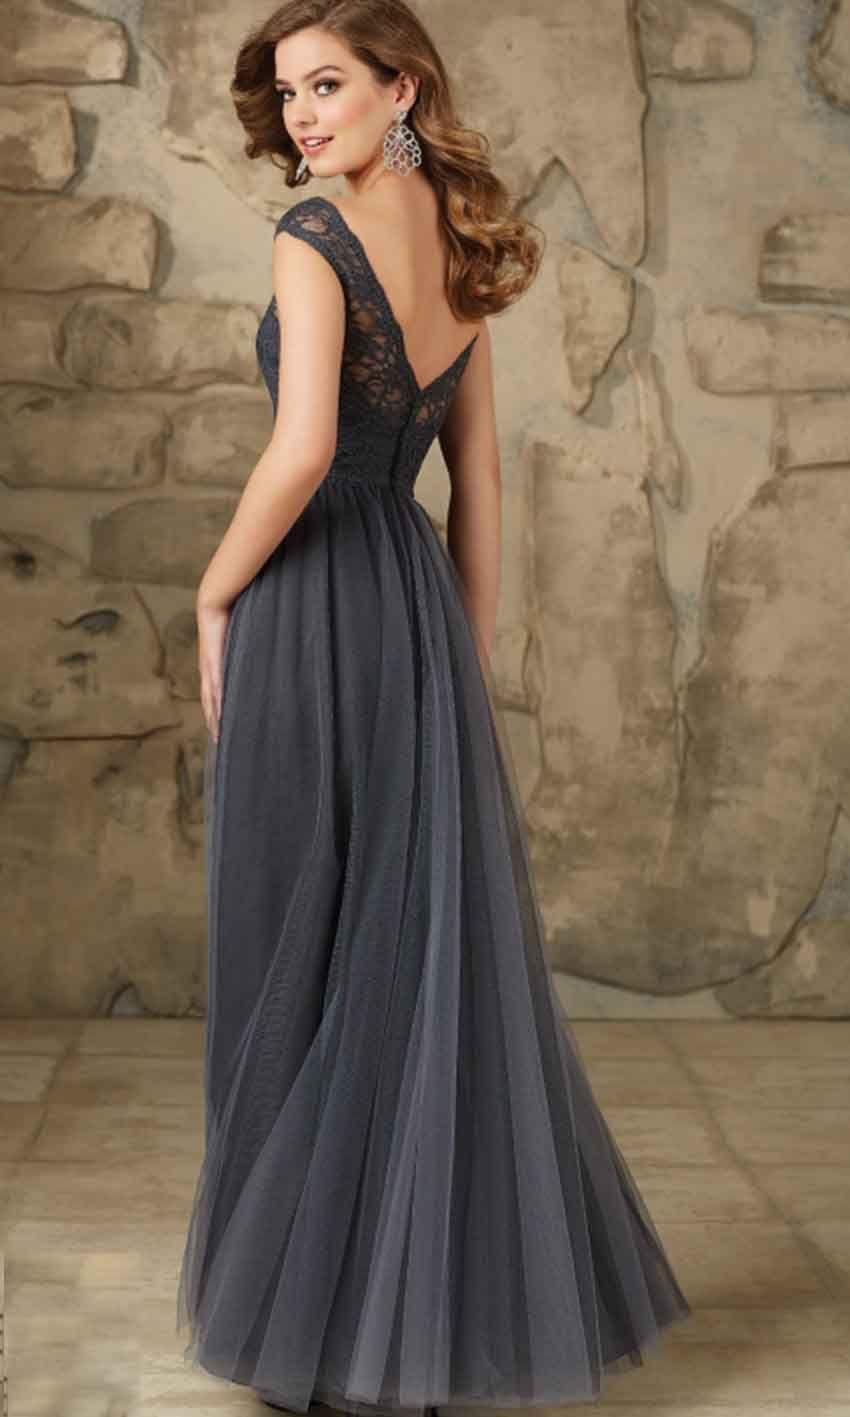 Dark gray long lace bridesmaid dresses uk ksp401 pinteres dark gray long lace bridesmaid dresses uk ksp401 more ombrellifo Gallery